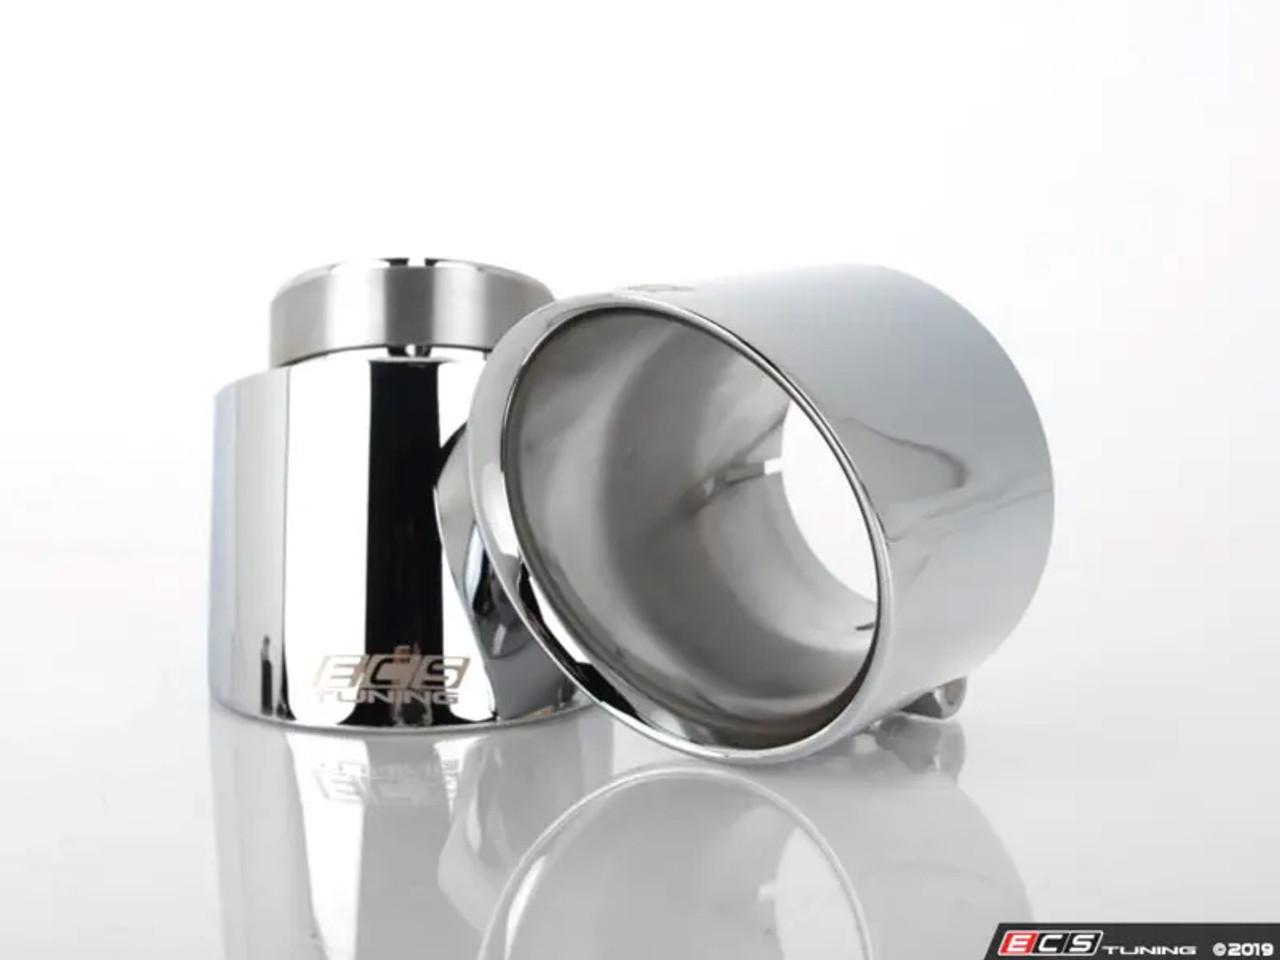 ecs tuning 4 oe fit exhaust tips chrome pair mk6 mk7 gti